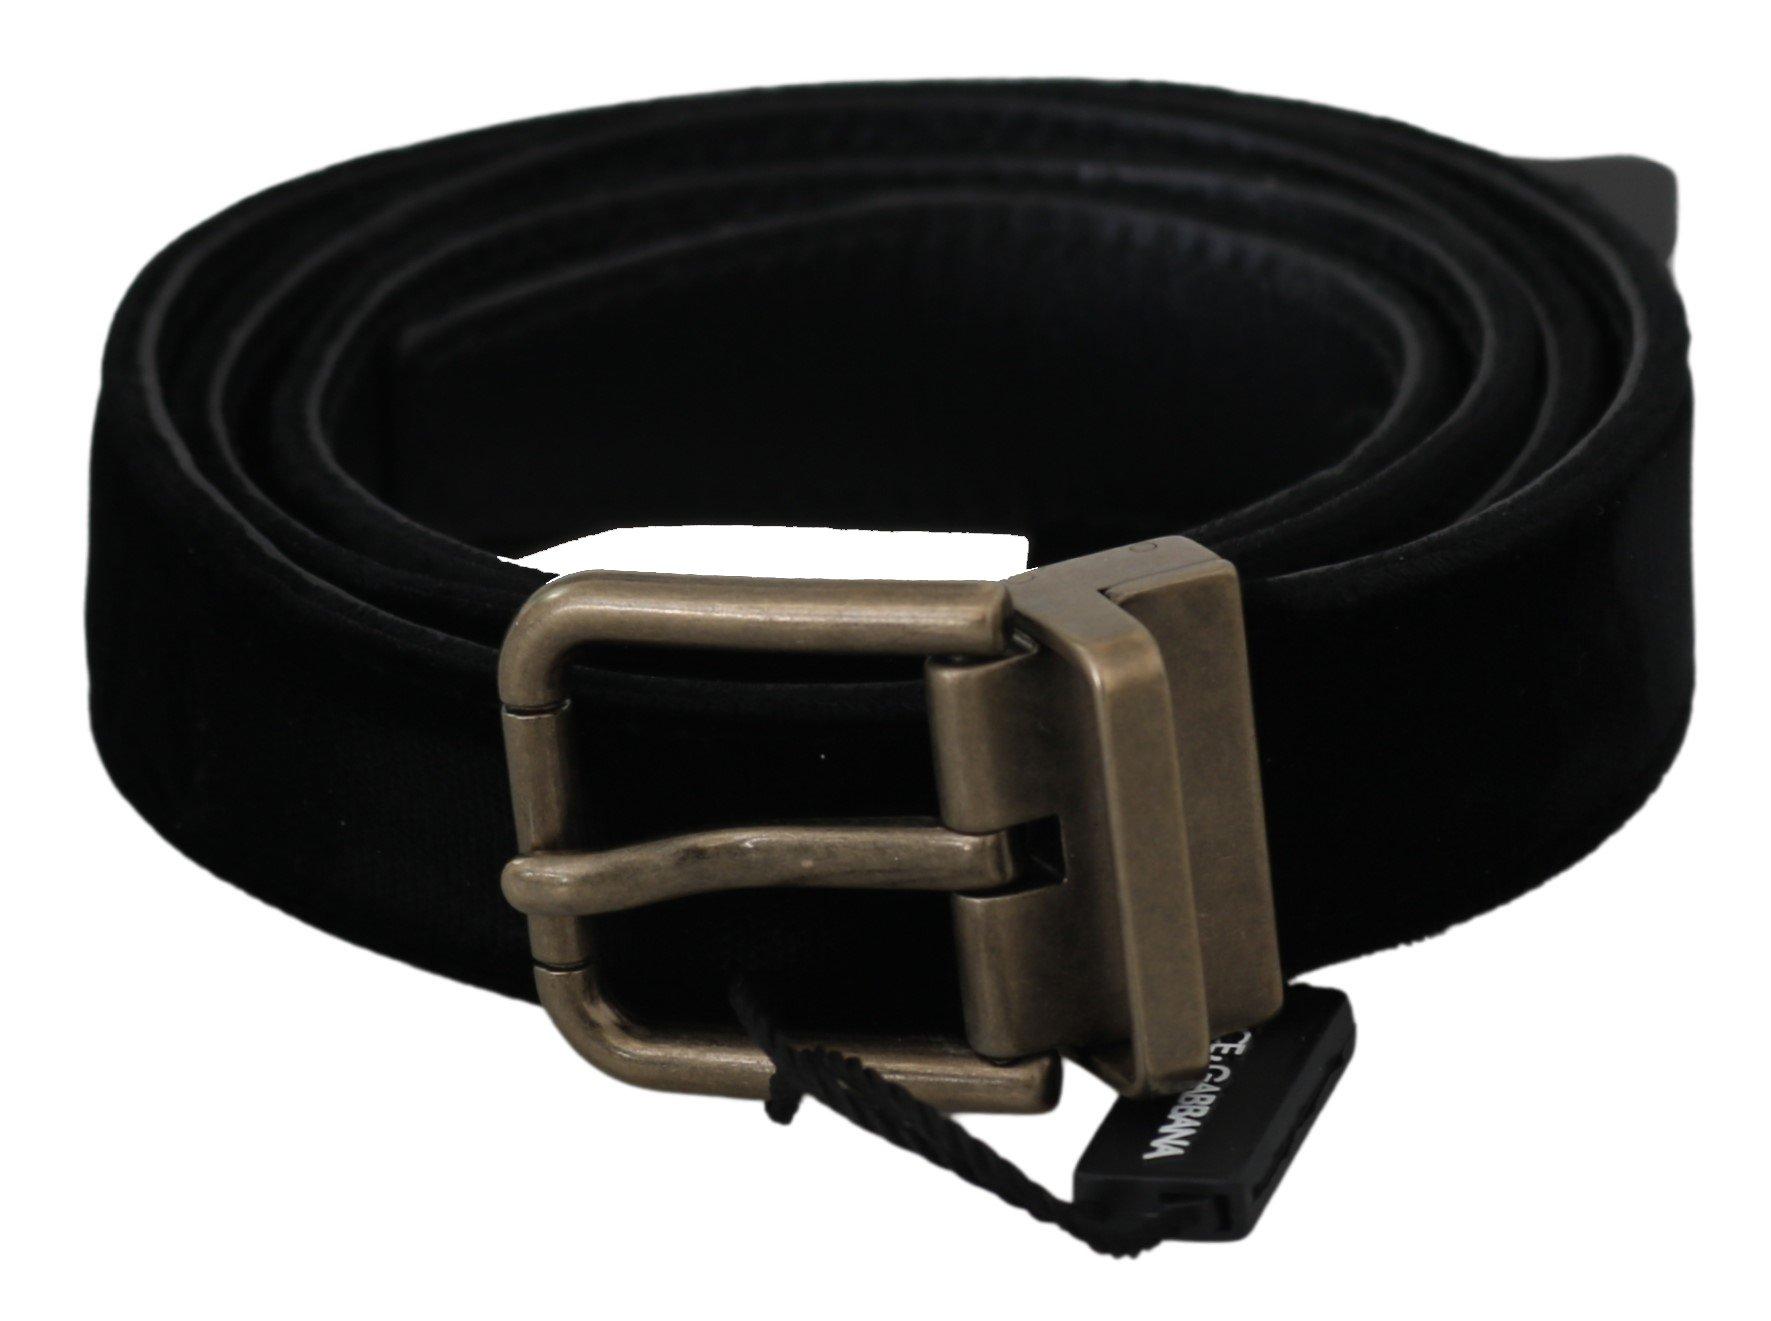 Black Solid Leather Velvet Gold Buckle Belt - 90 cm / 36 Inches